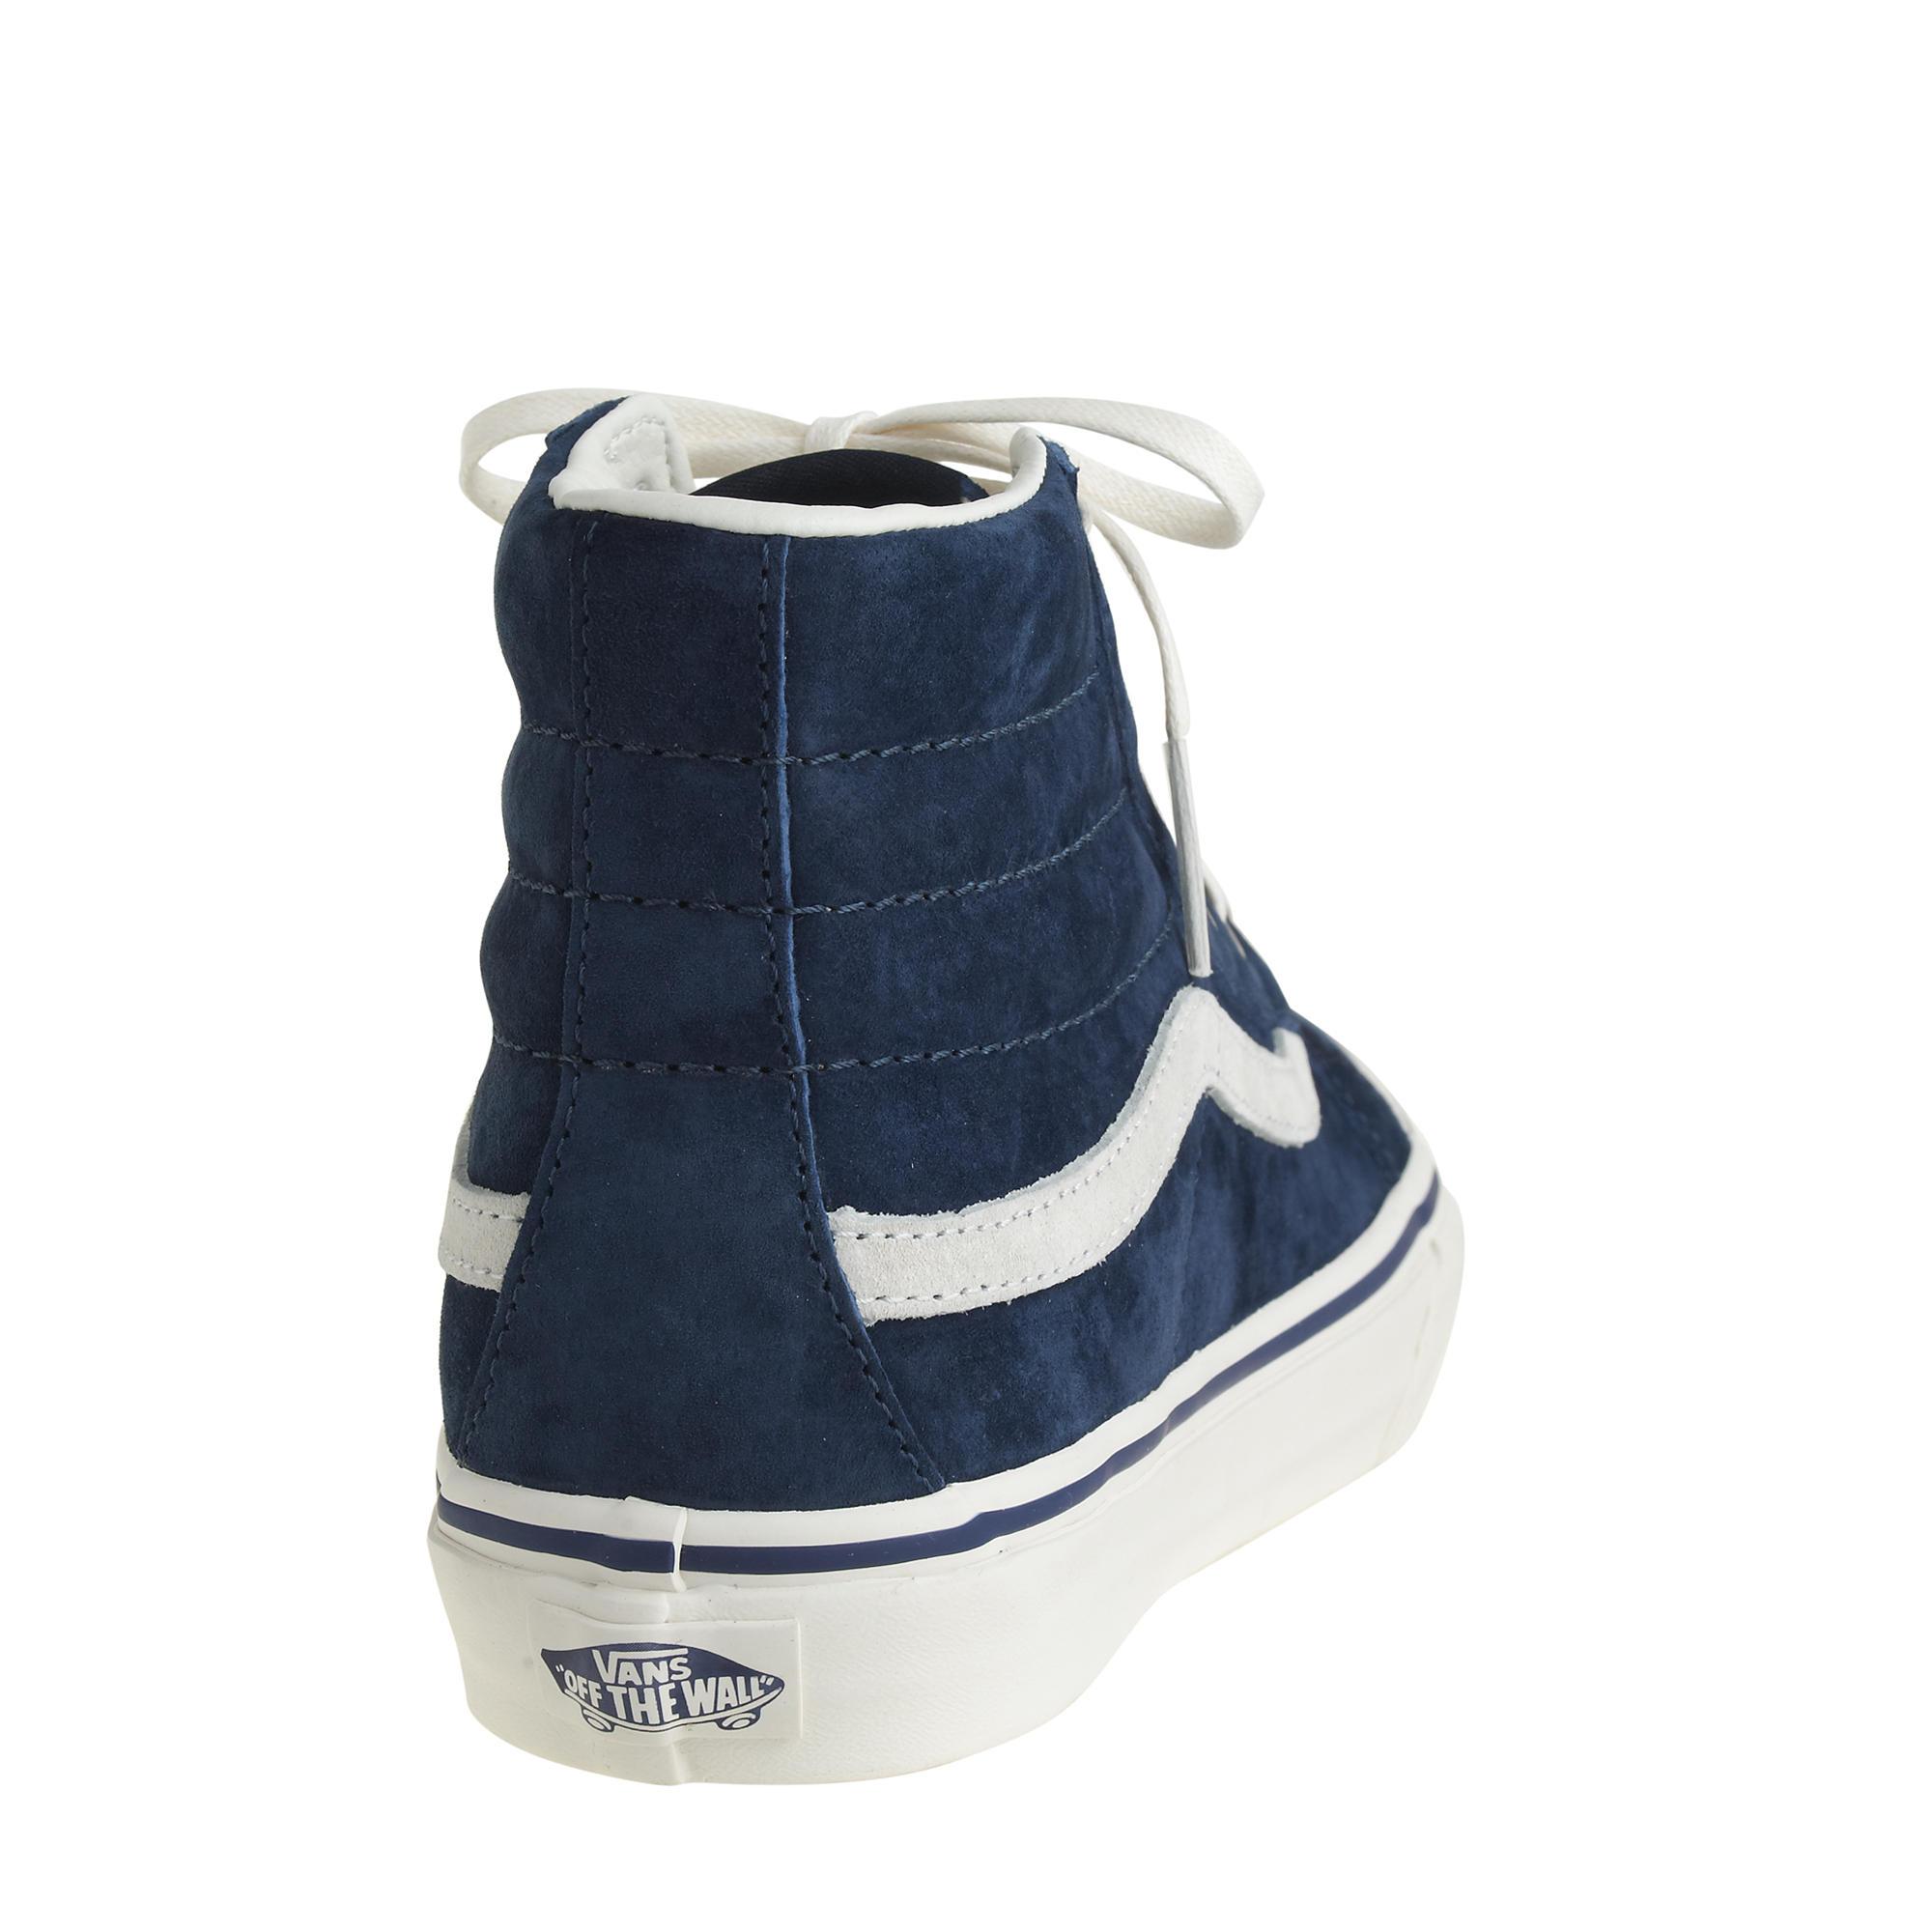 1d375cd1c86549 Lyst - J.Crew Unisex Vans Sk8-hi Sneakers in Blue